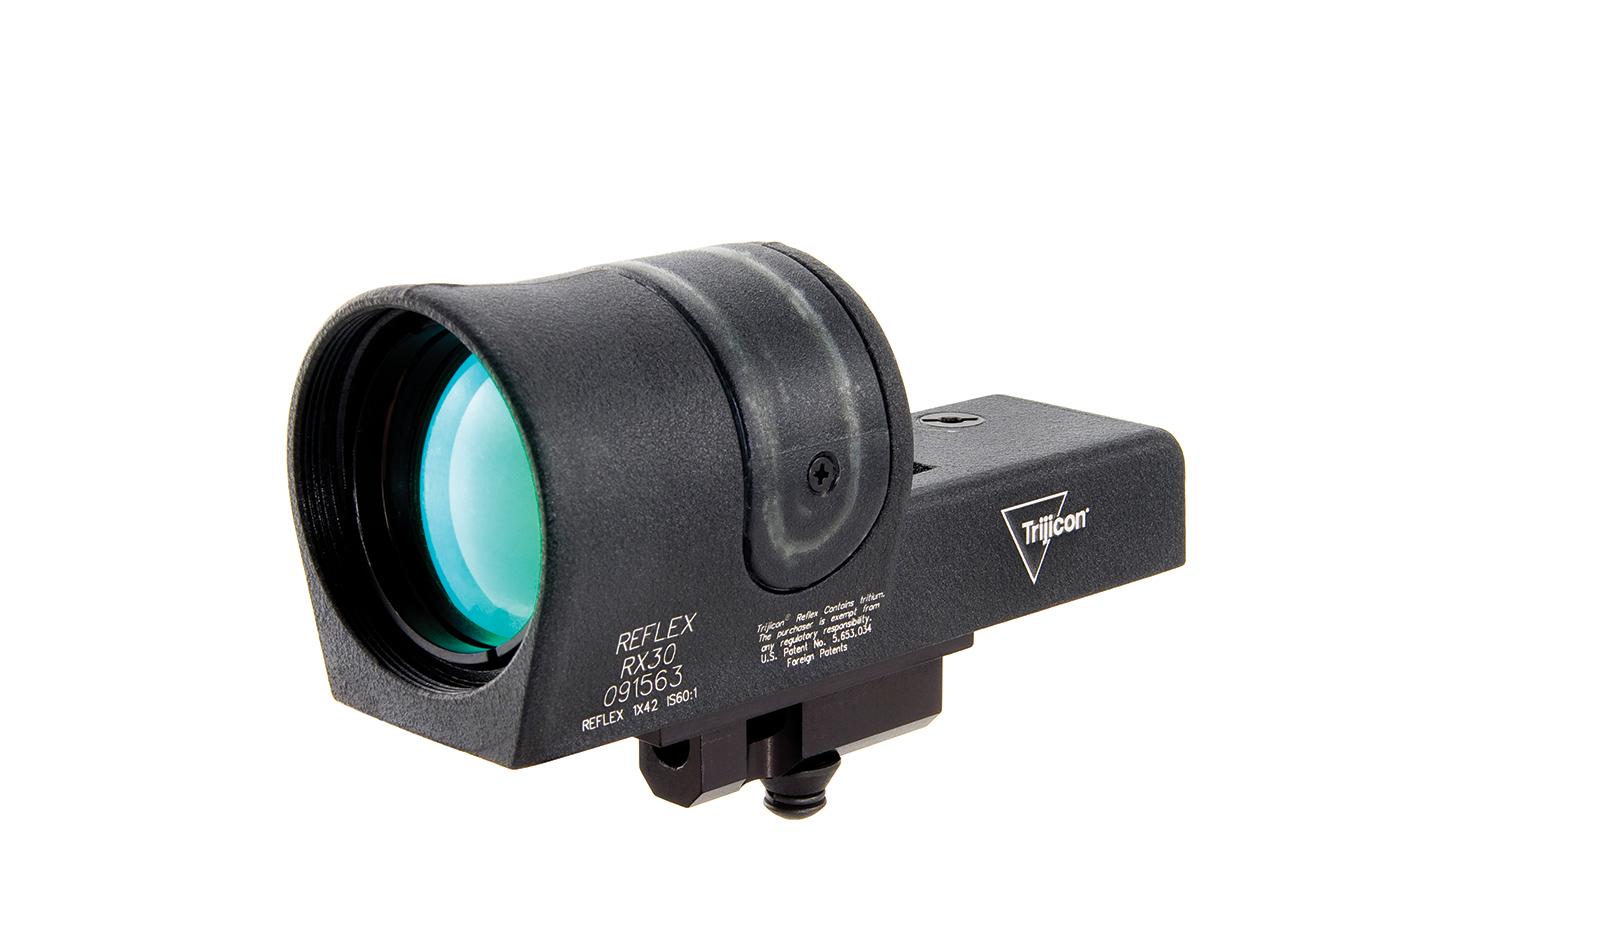 RX30-25 angle 1